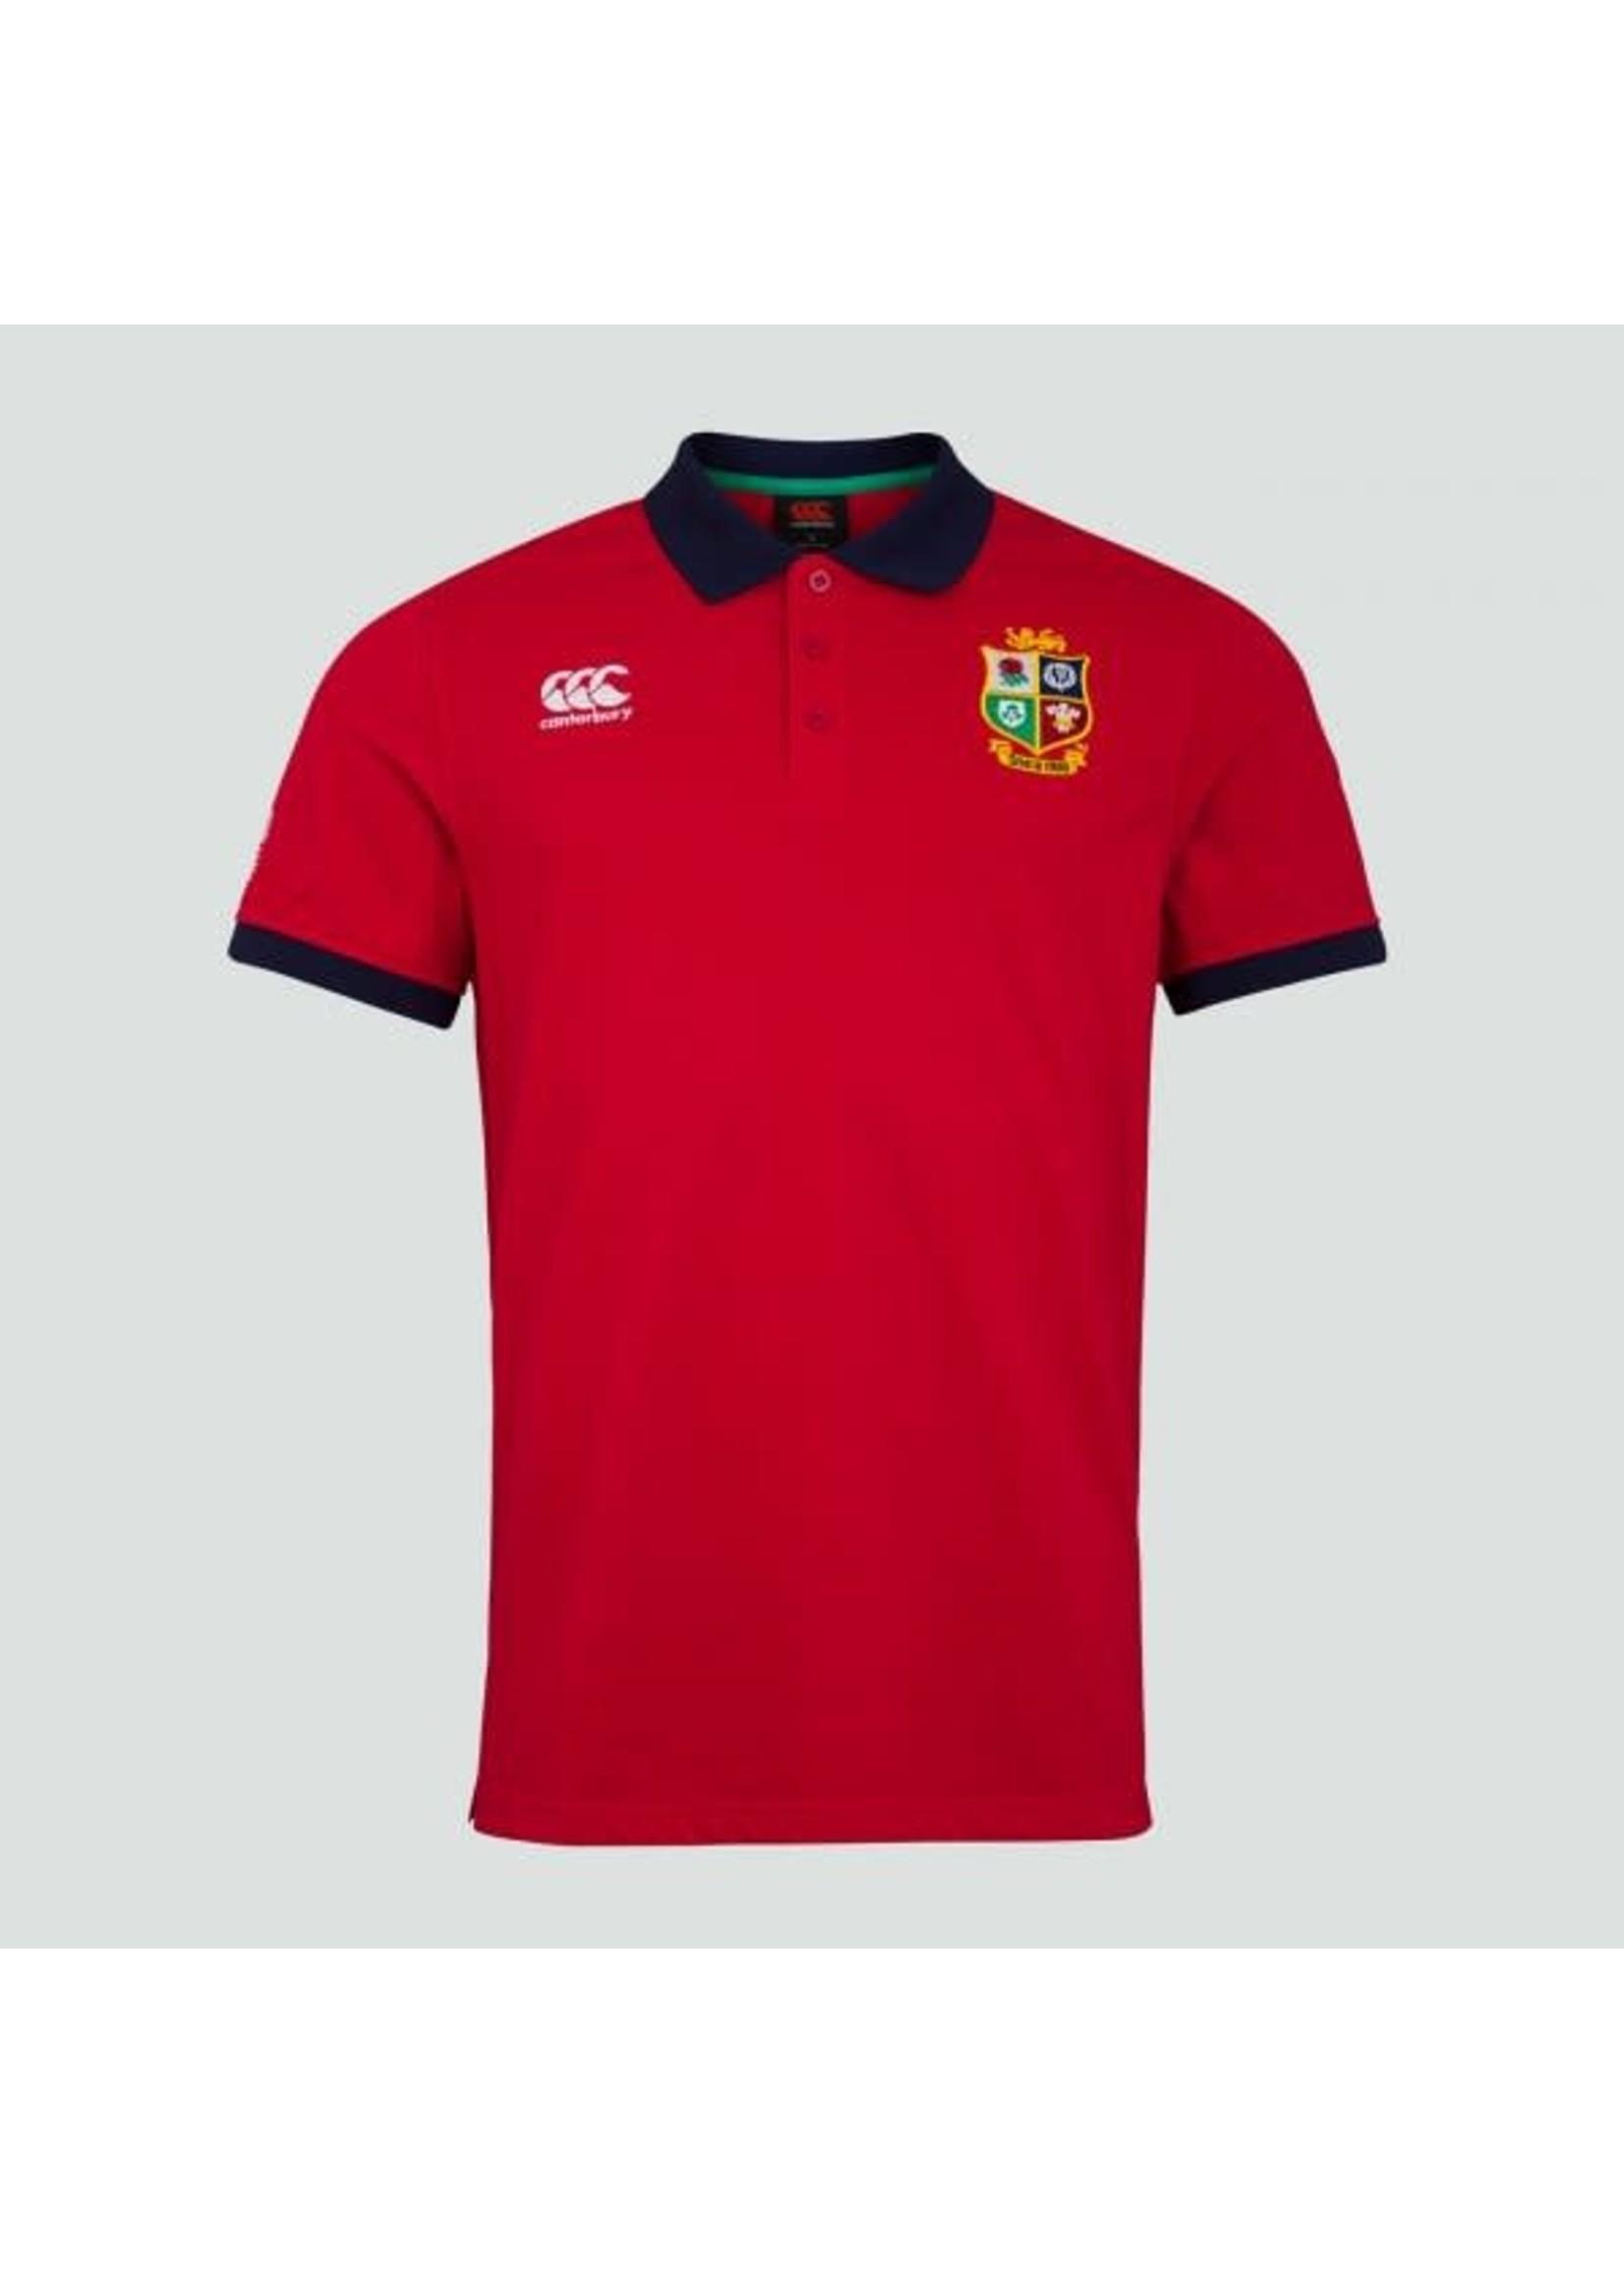 Canterbury British & Irish Lions -  Home Nations Polo Shirt (2021)  Red